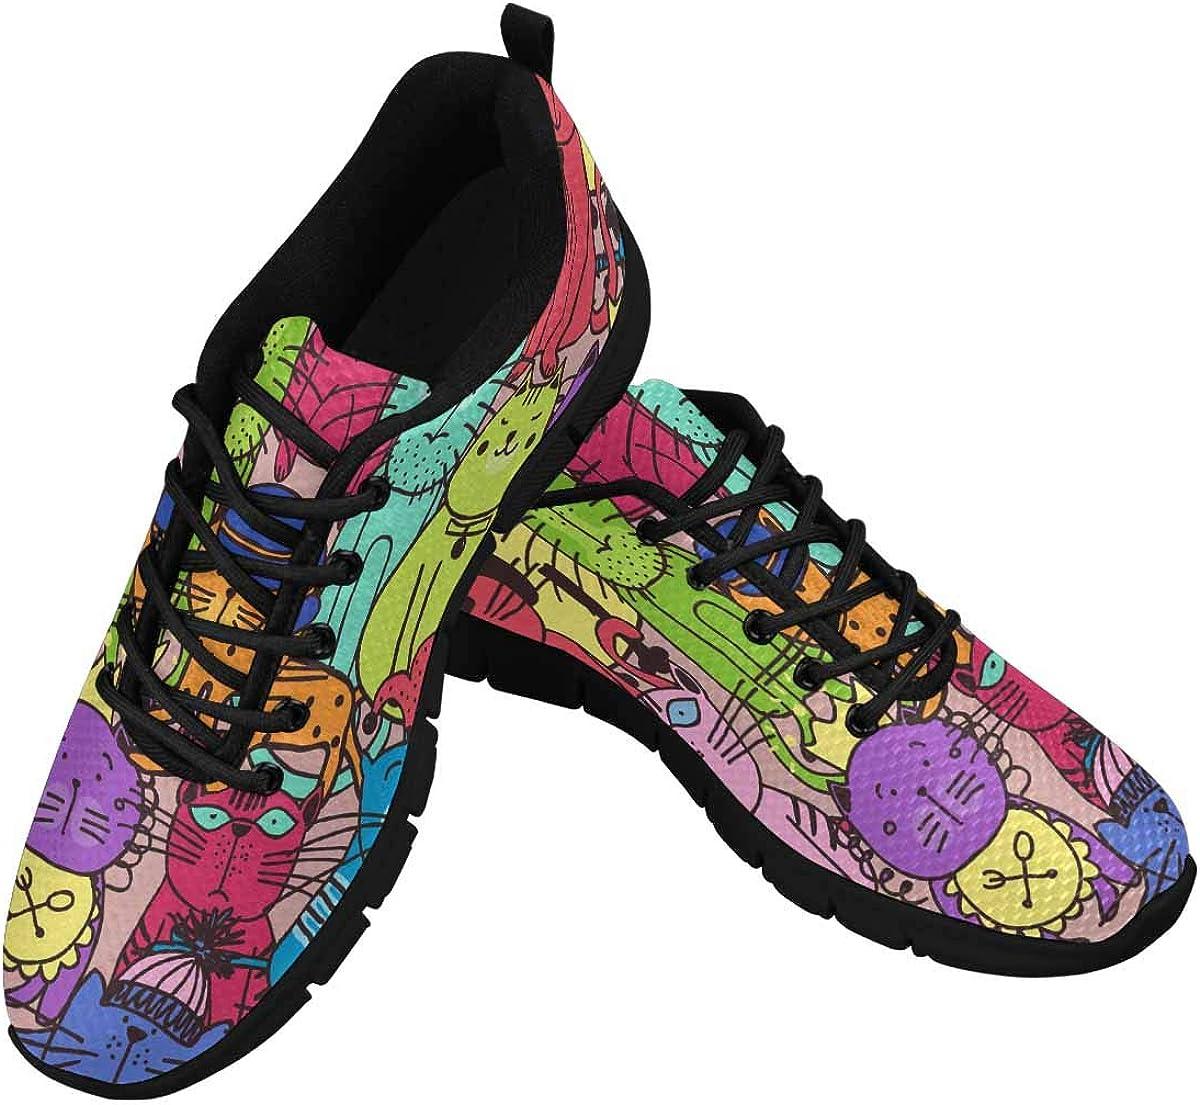 INTERESTPRINT Colorful Animals Women's Tennis Running Shoes Lightweight Sneakers